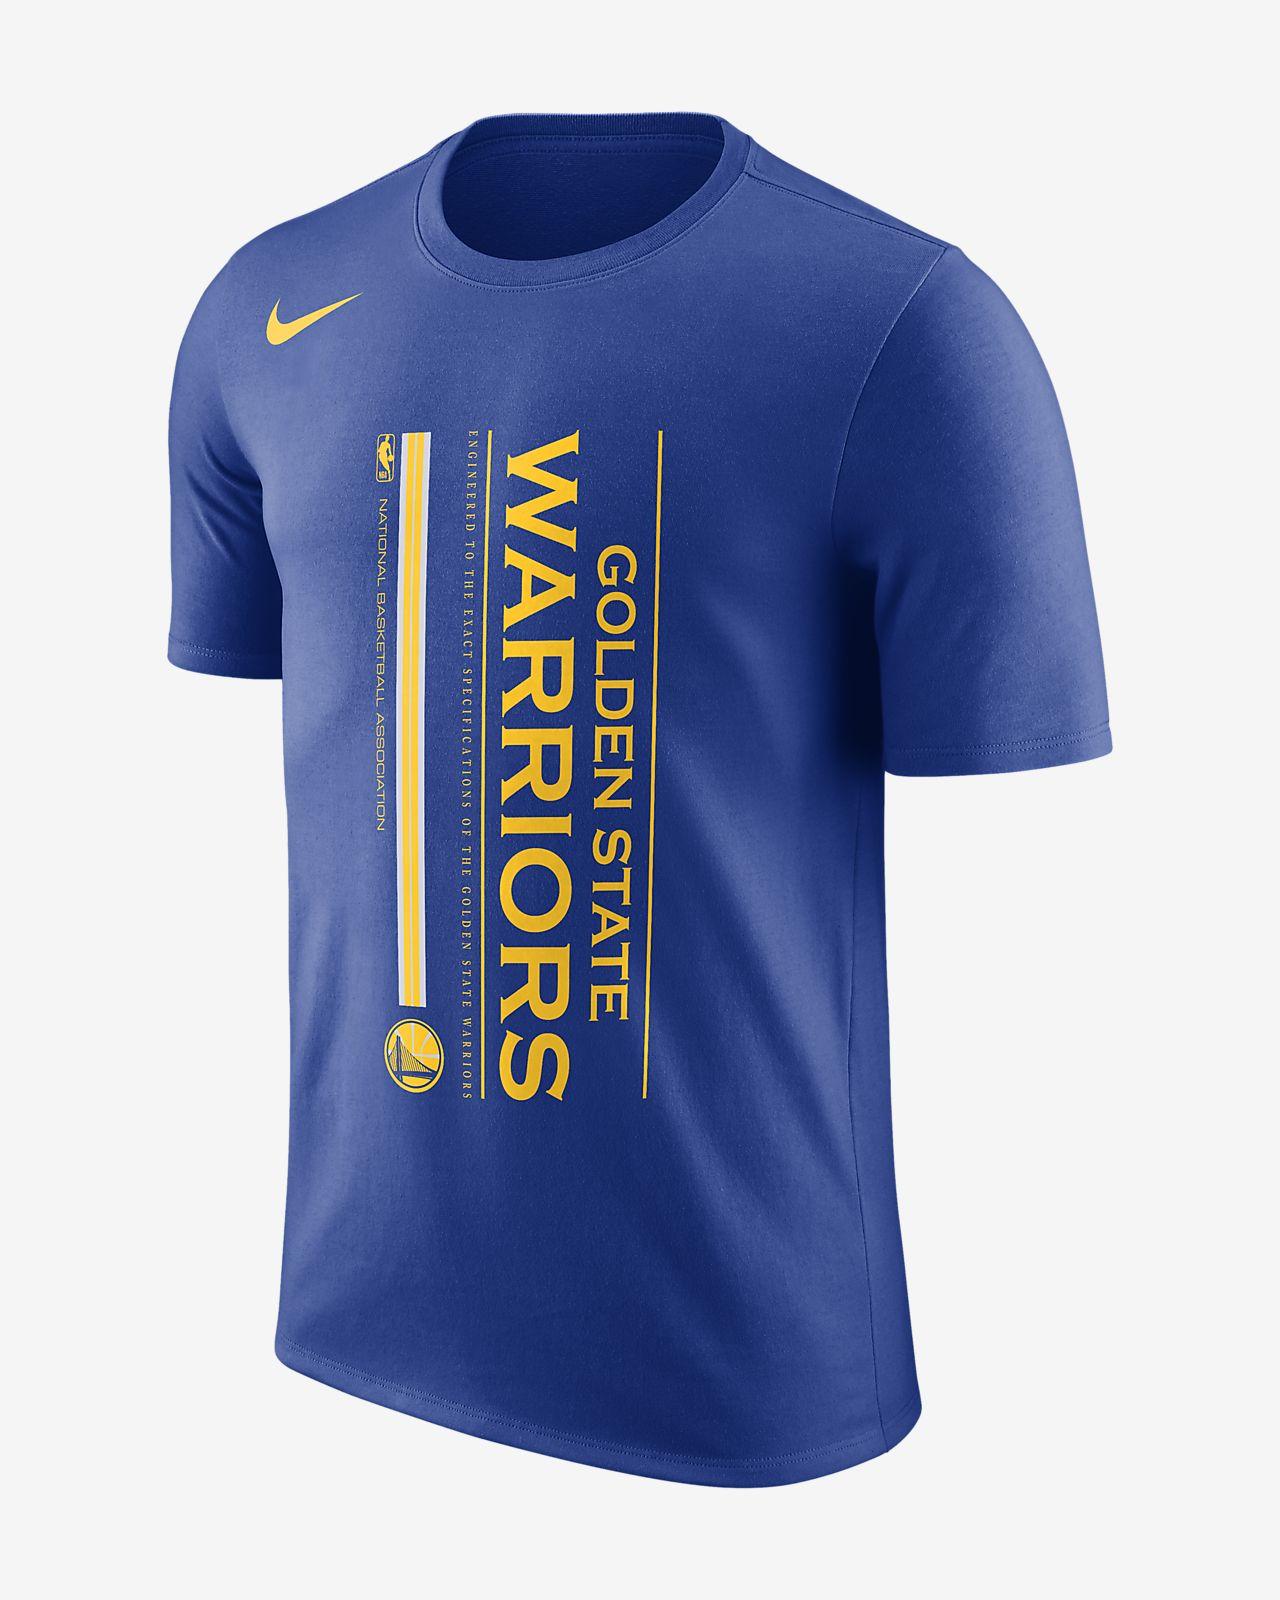 Golden State Warriors Nike Dri-FIT 男款 NBA T 恤